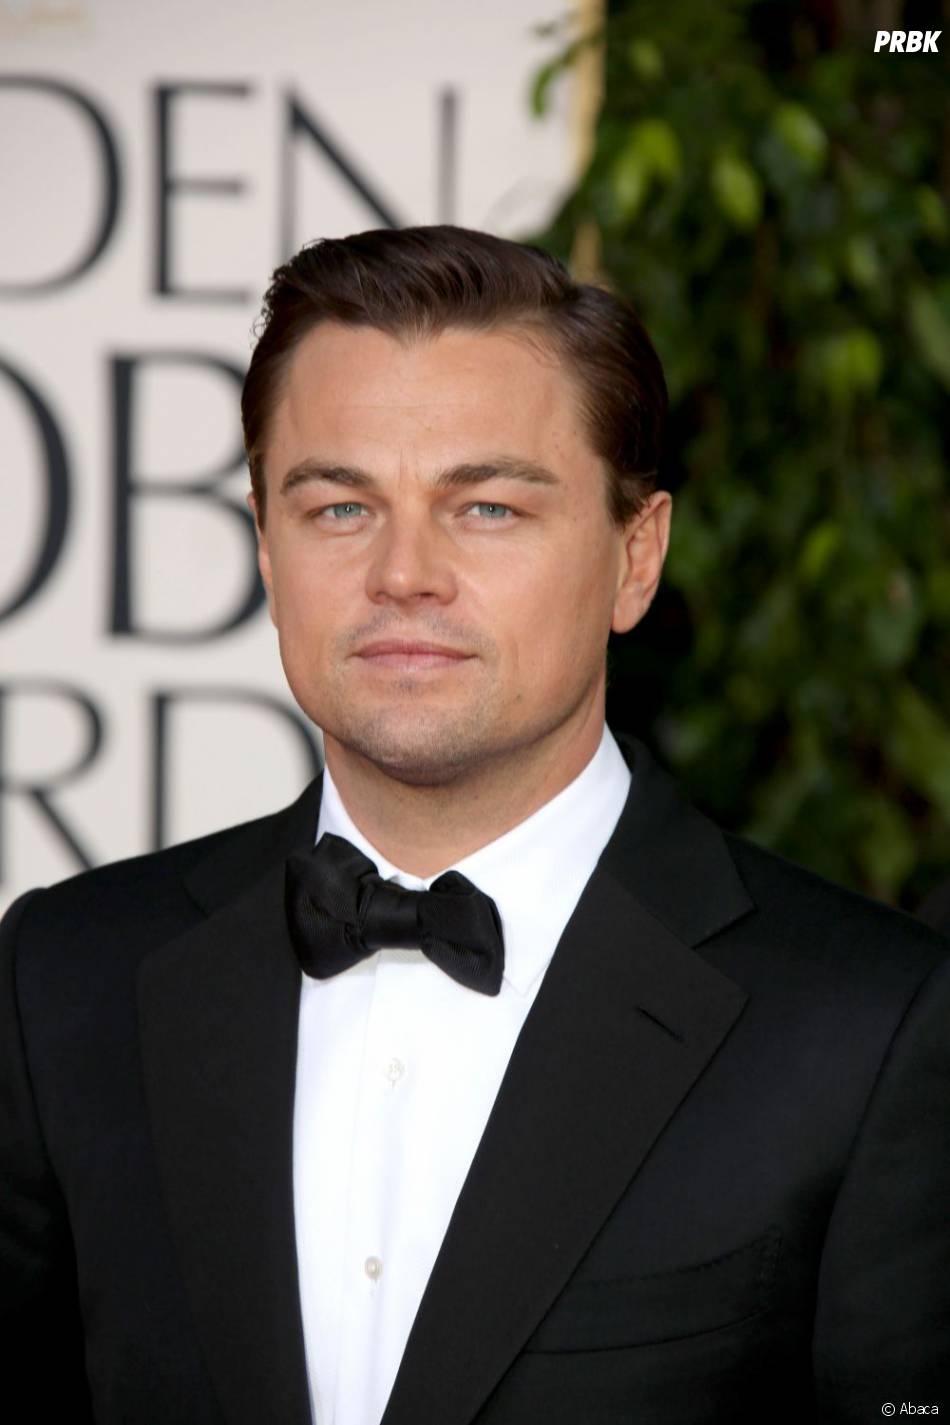 Leonardo dicaprio est gaga de jean dujardin for Dujardin dicaprio